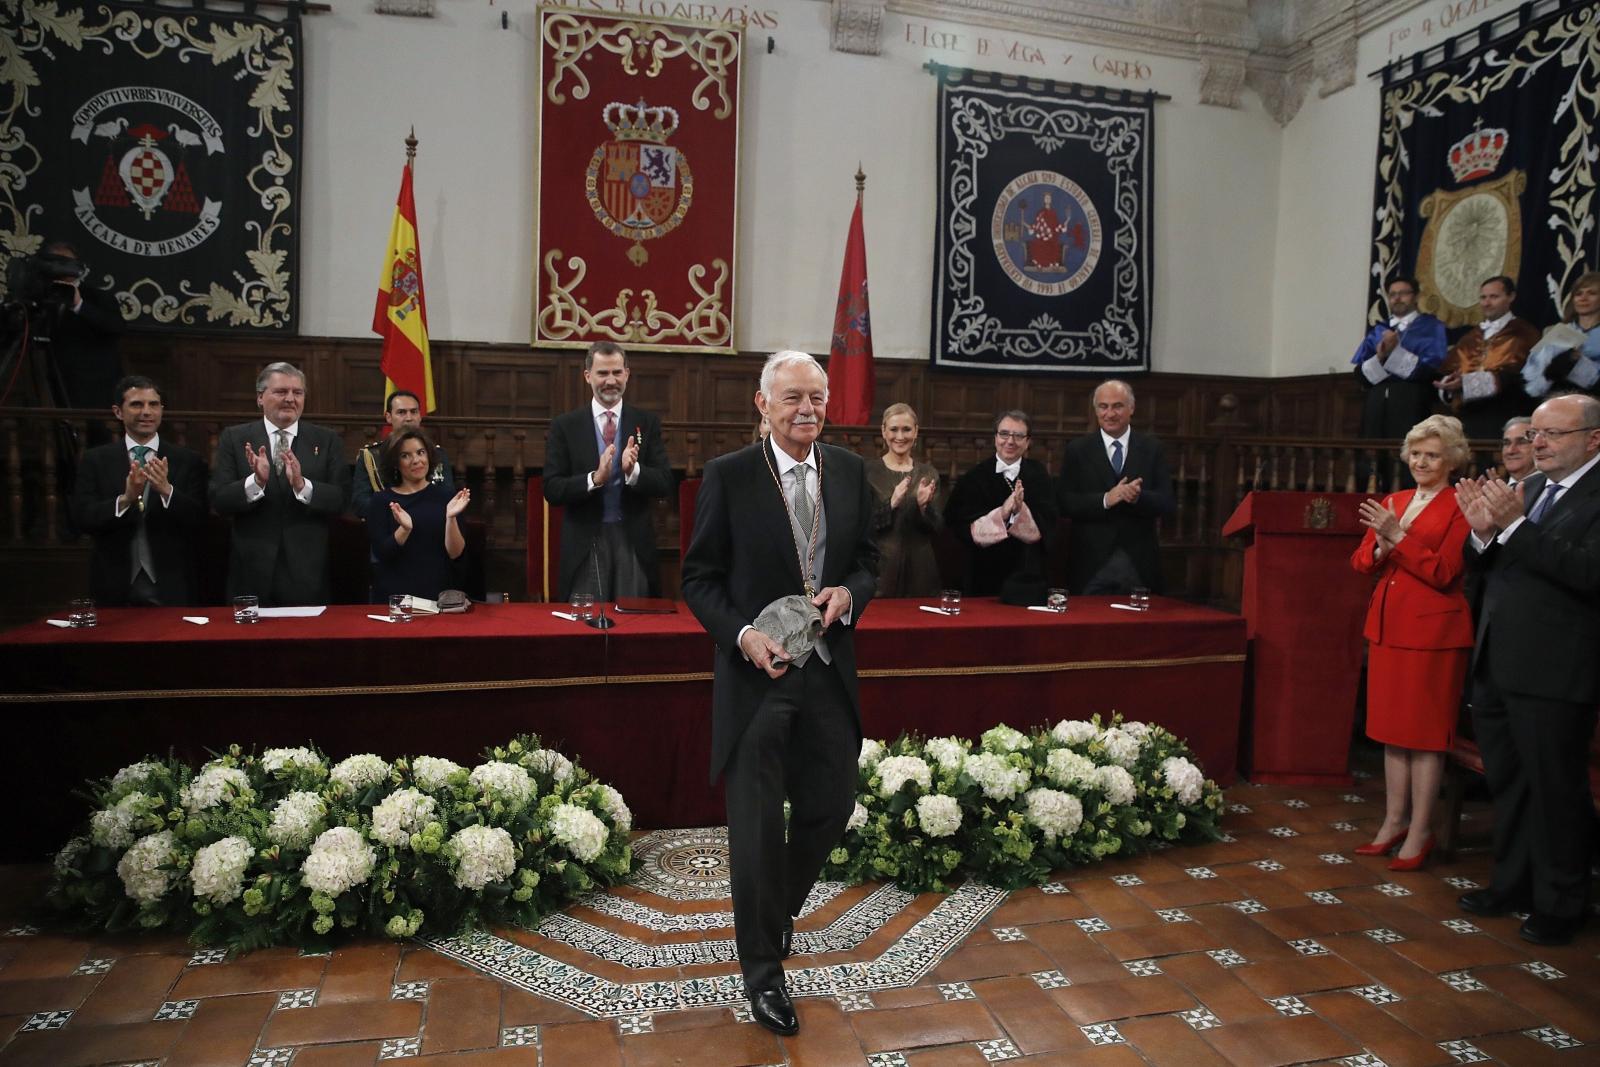 Hiszpański pisarz Eduardo Mendoza otrzymuje od króla Felipie II literacką nagrodę Miguel de Cervantes 2016. Fot. PAP/EPA/Juan Carlos Hidalgo